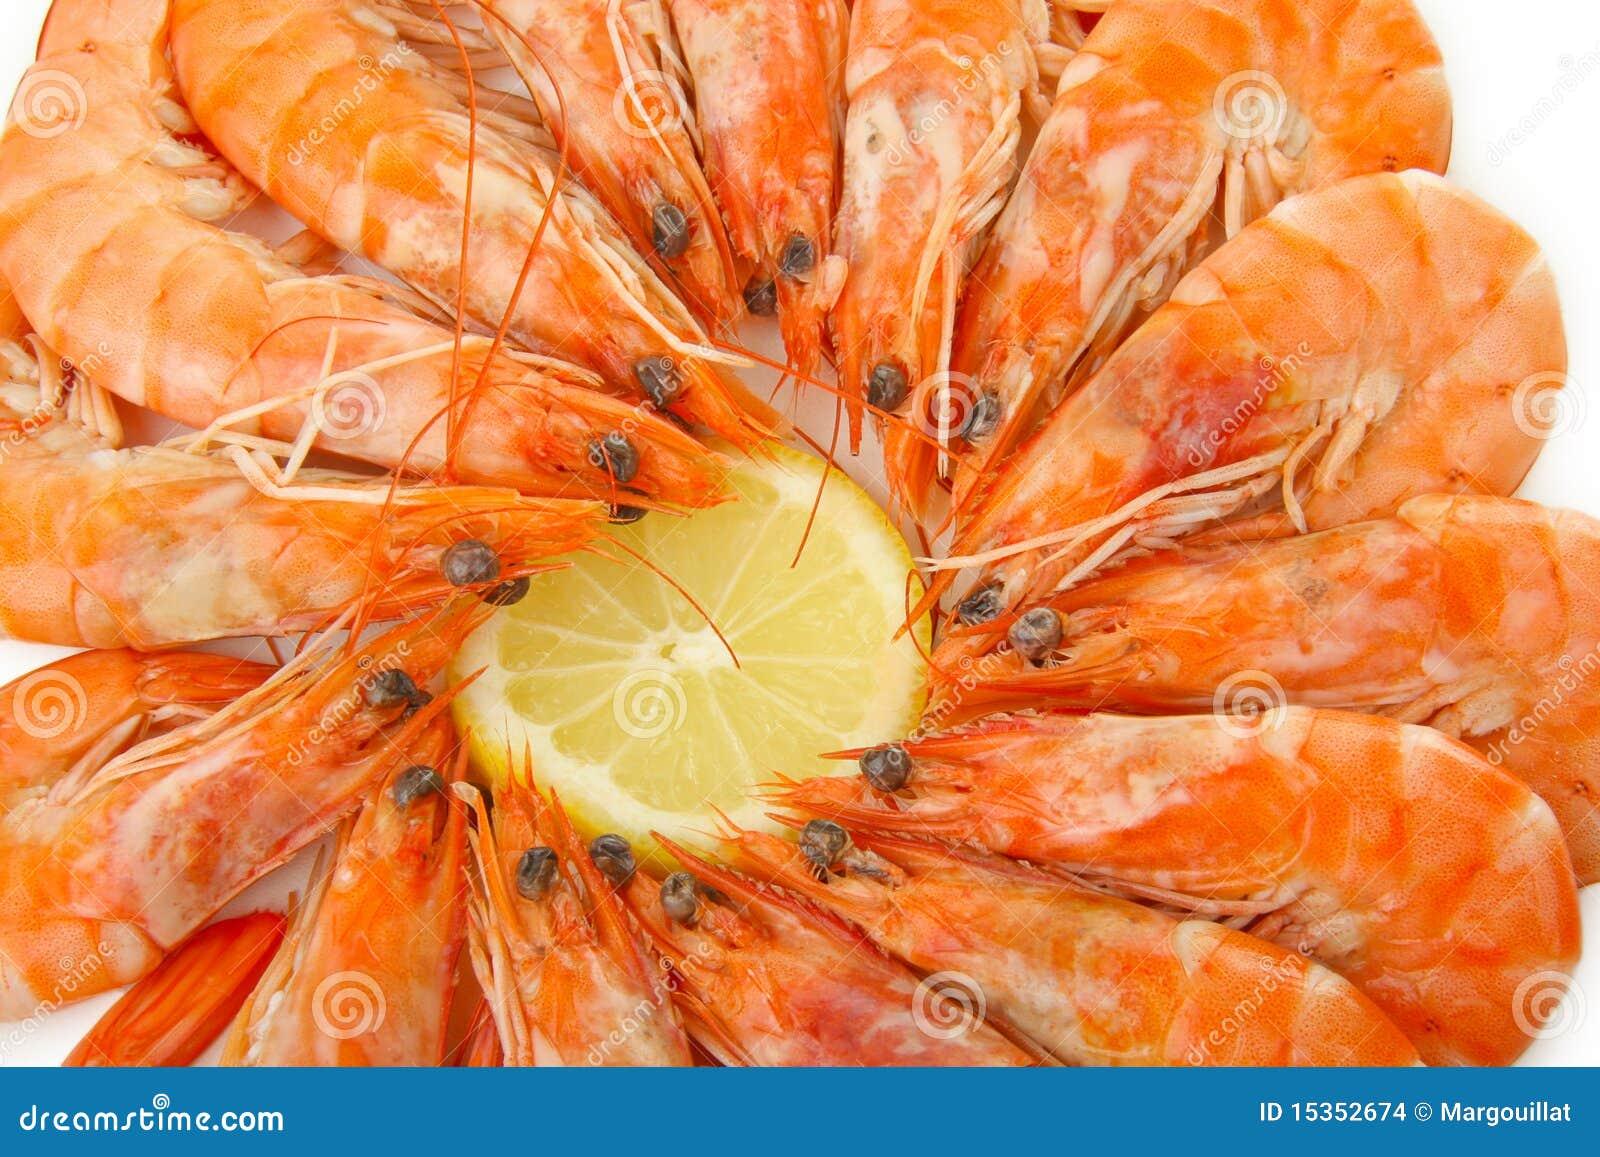 Shrimp Stock Images - Image: 15352674